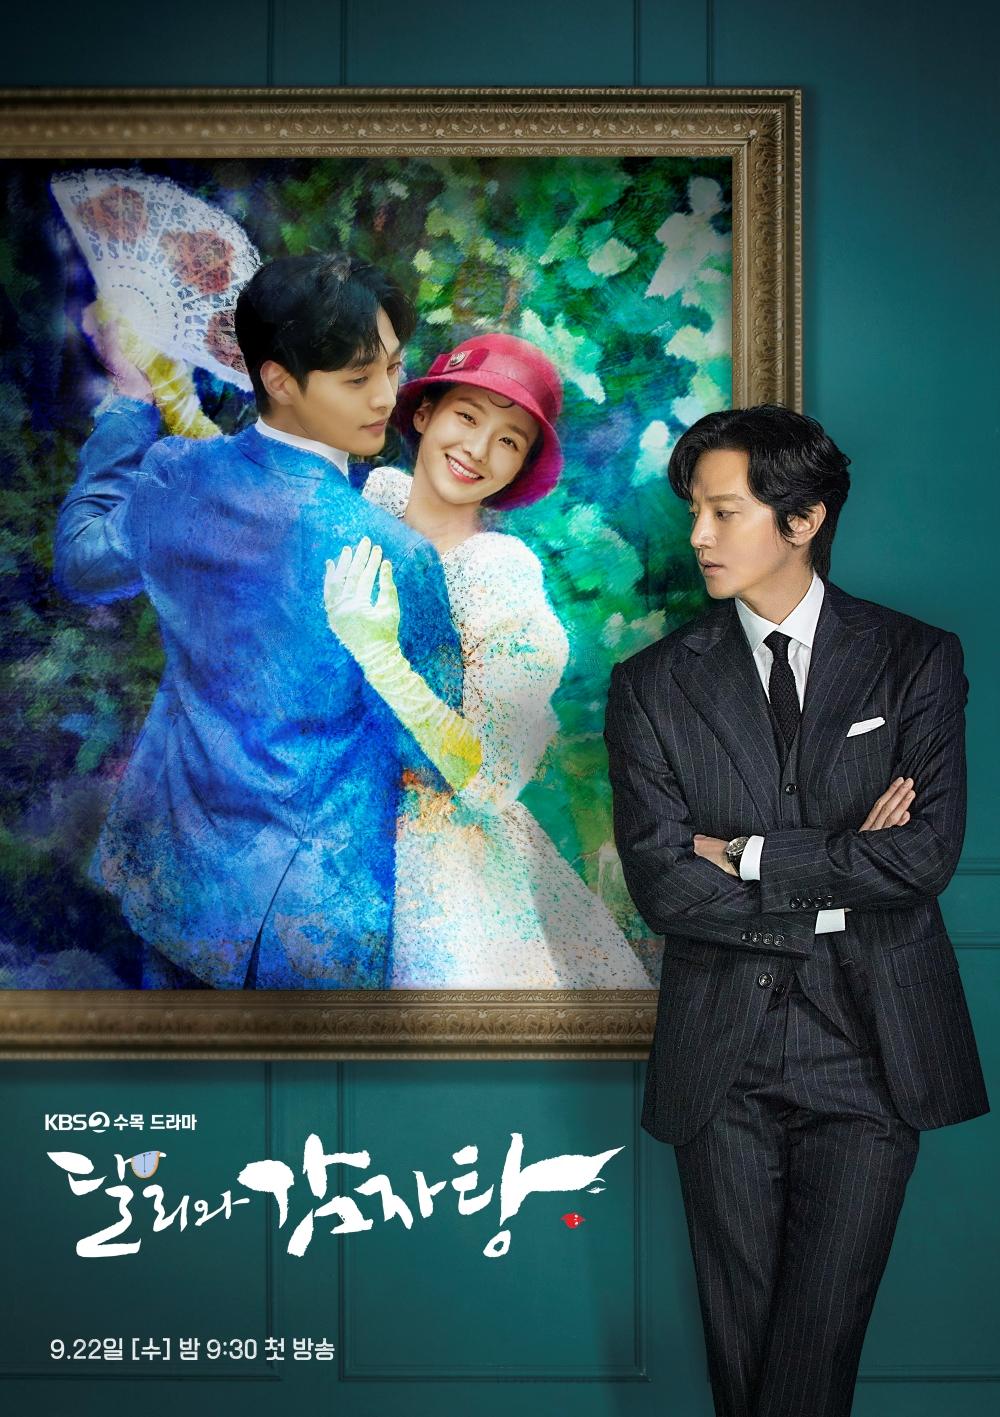 KBS 2TV 달리와 감자탕